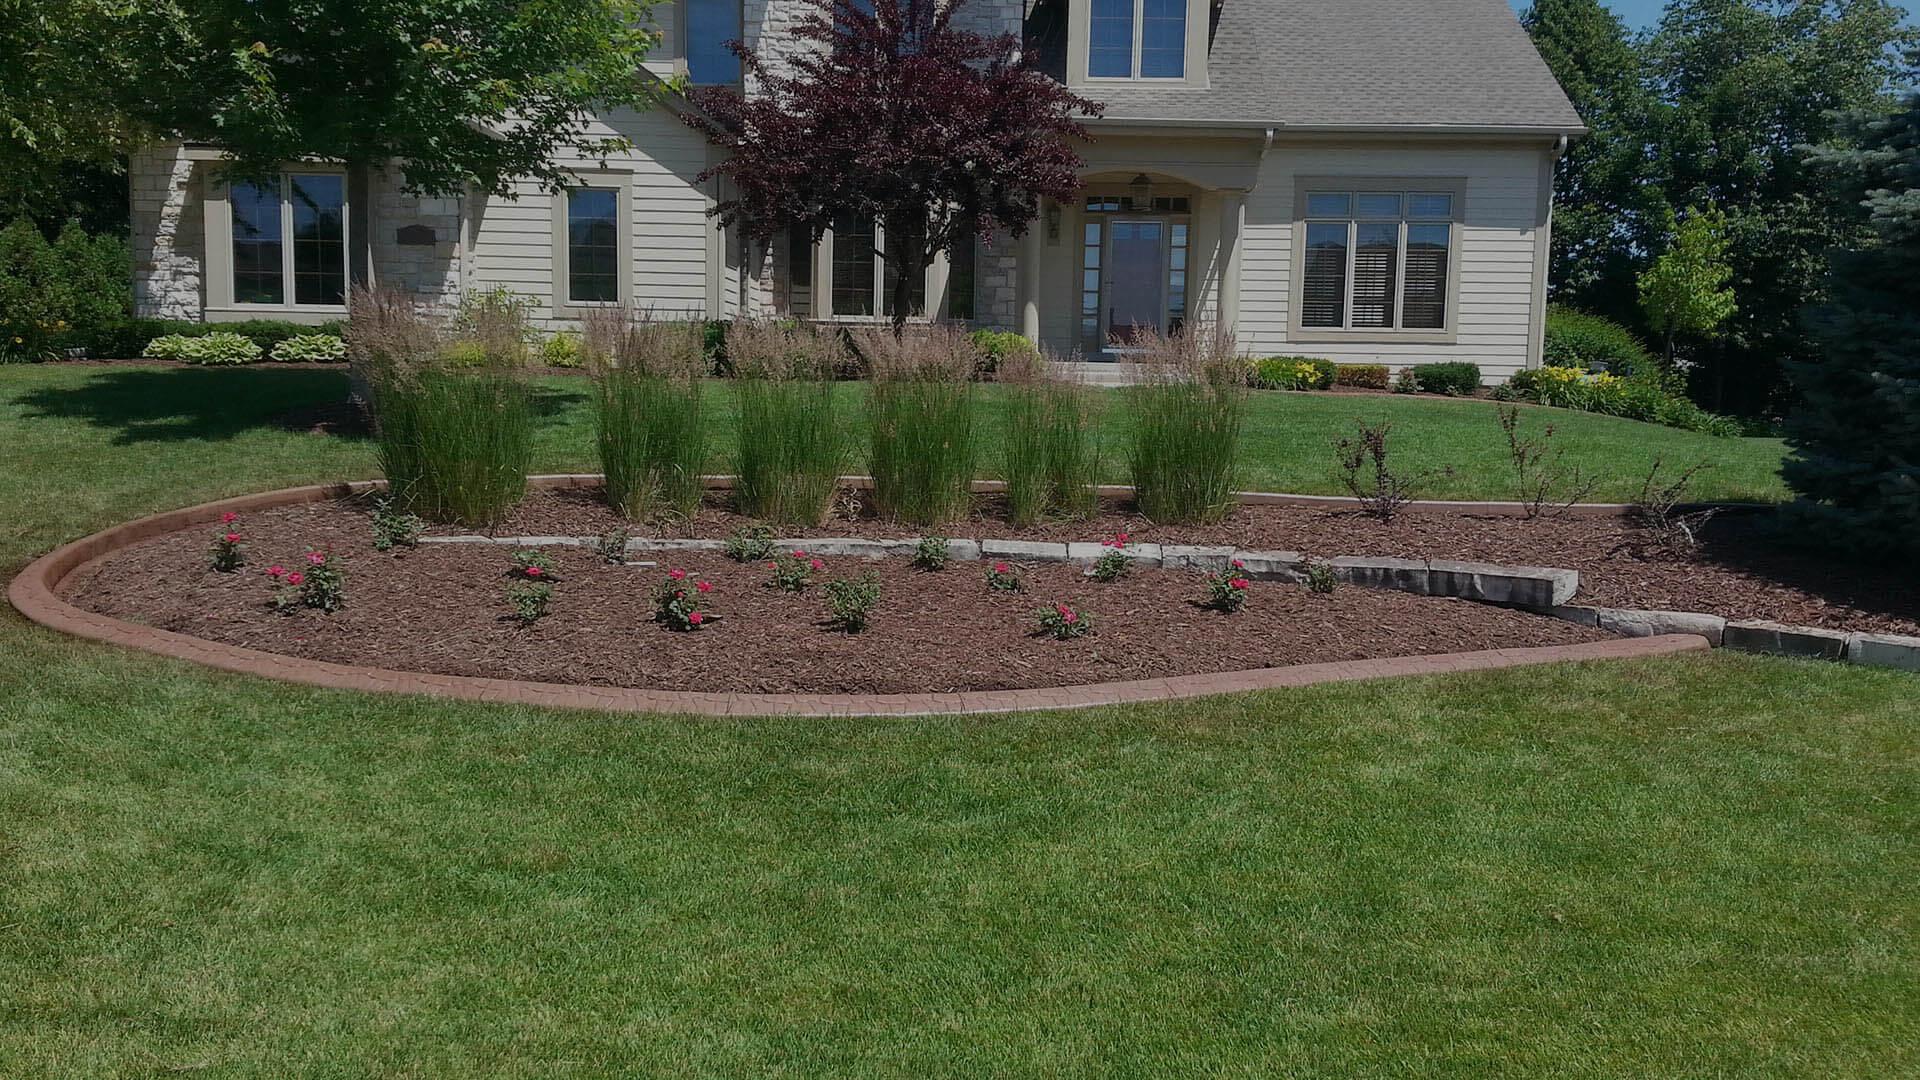 JL Property Services, LLC Landscaping, Fertilization and Concrete Edging slide 1